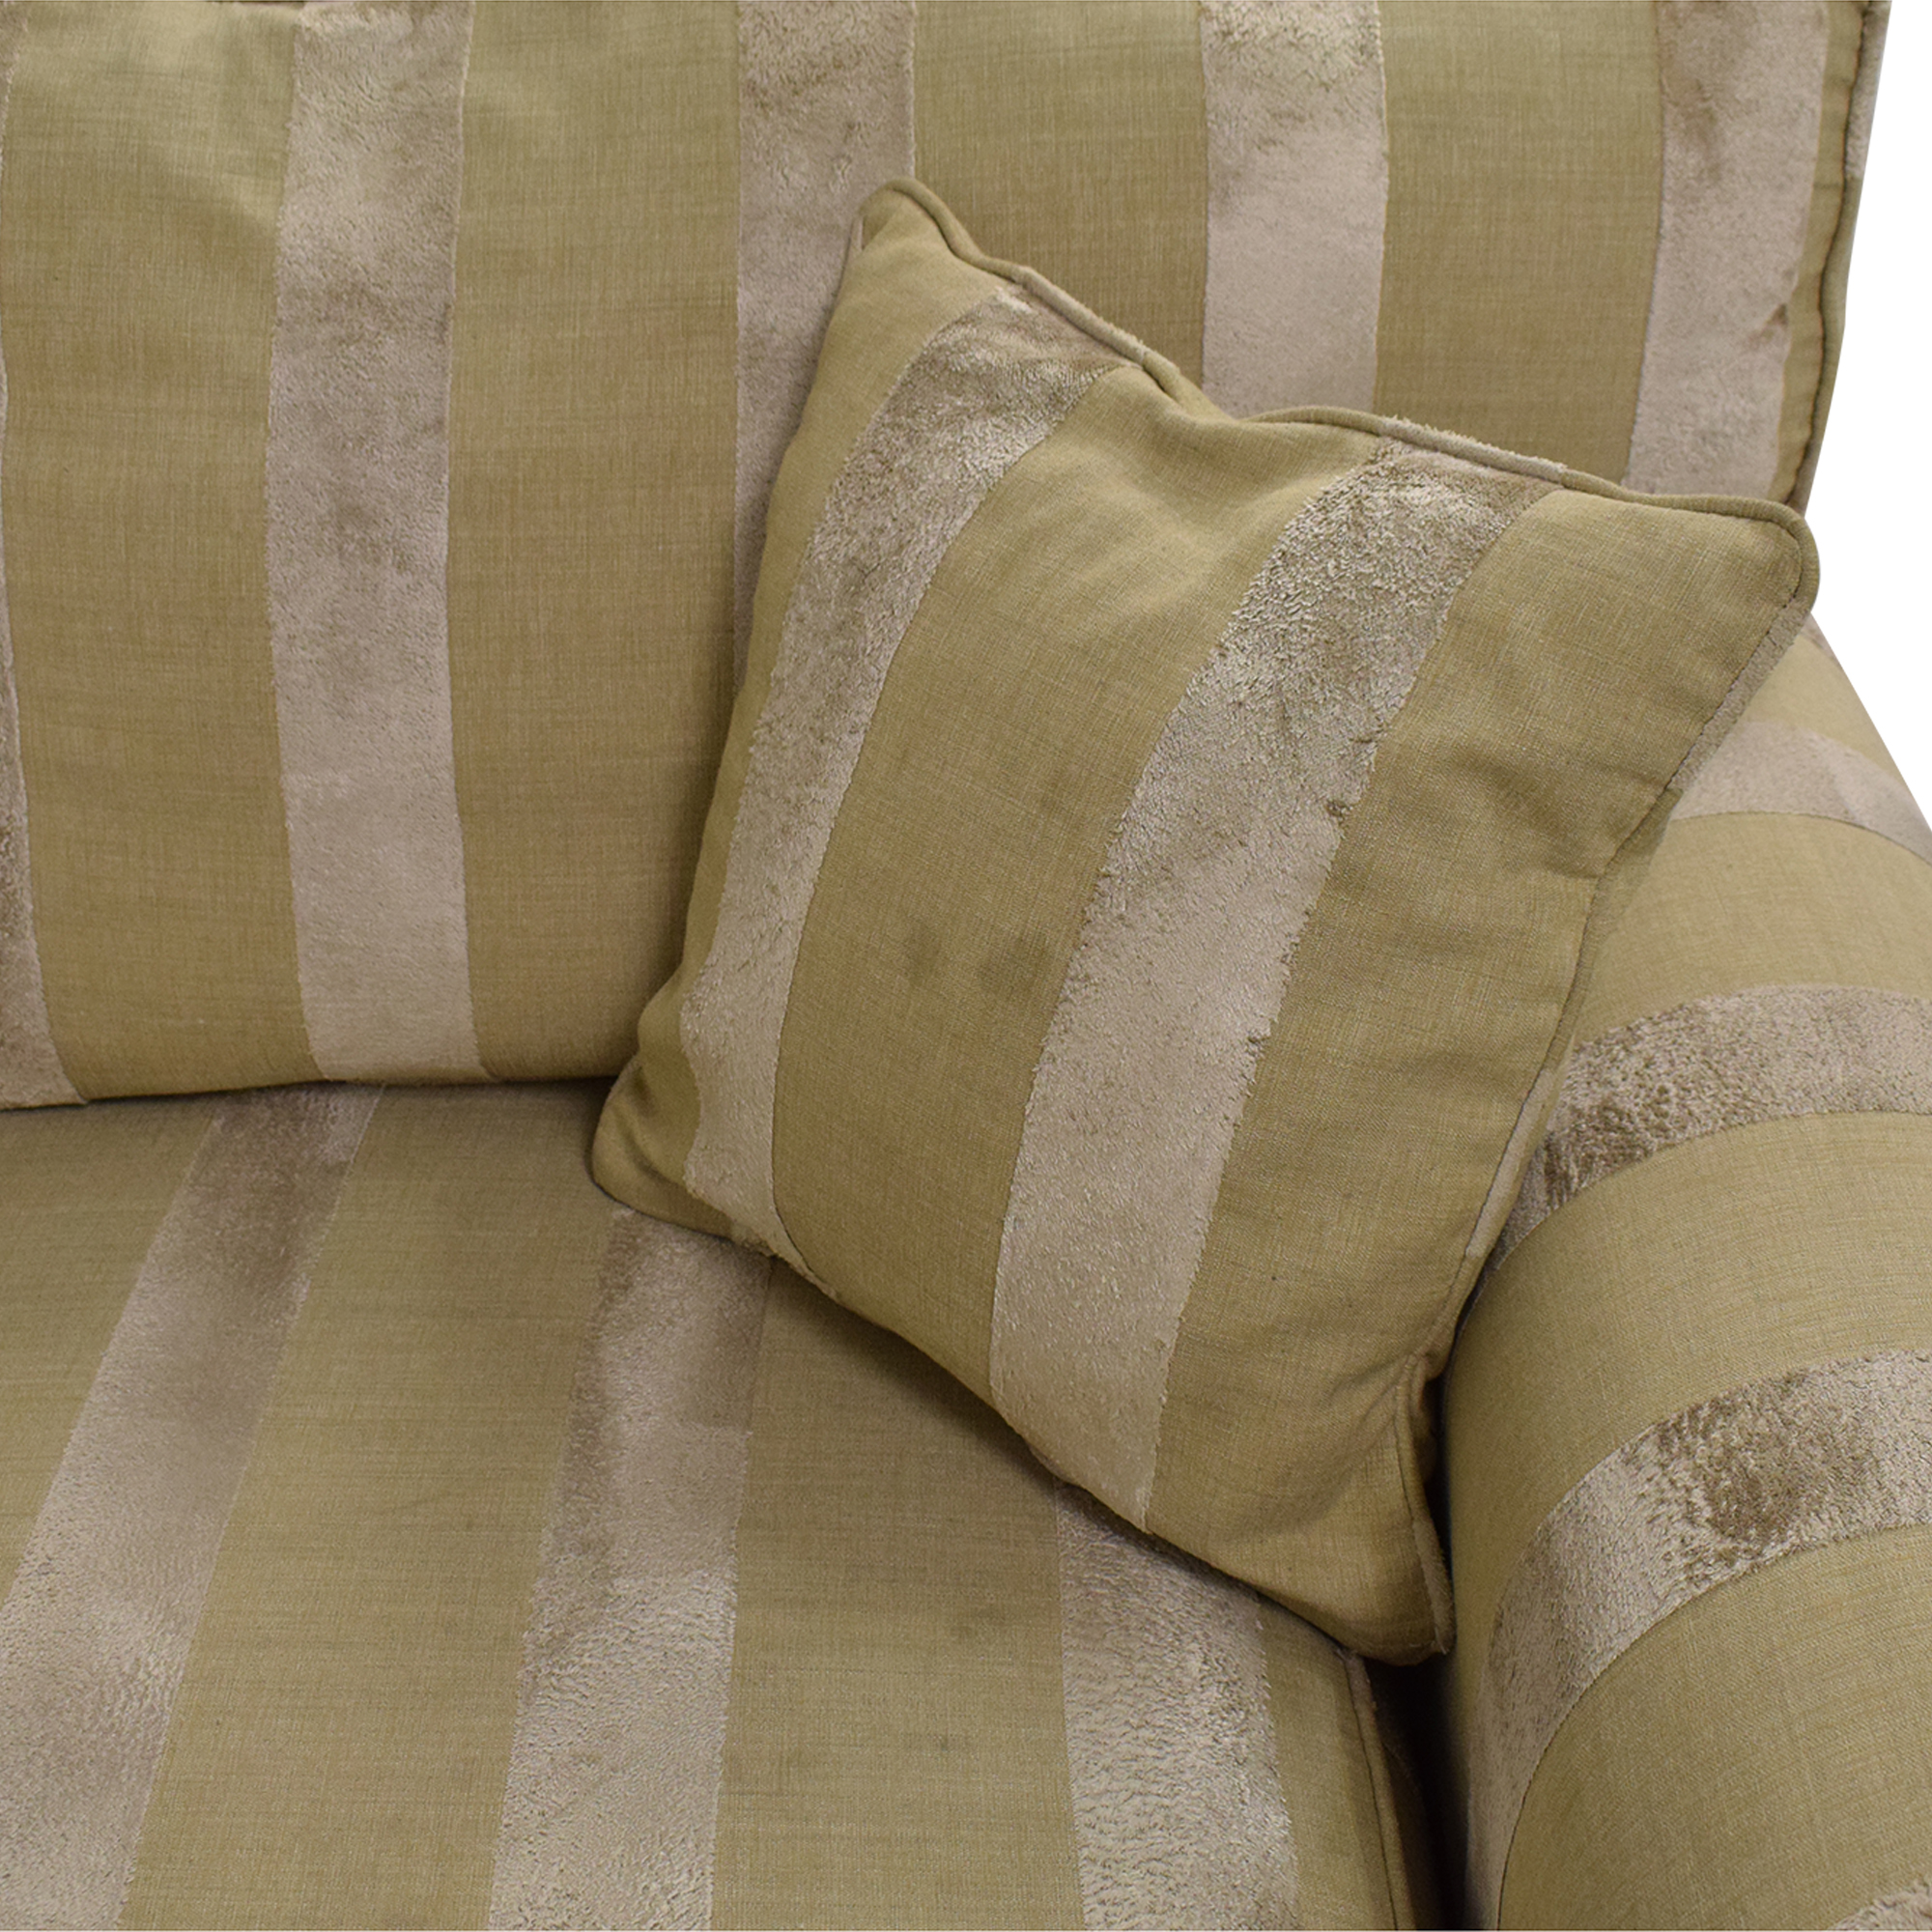 Ethan Allen Bennet Sectional Sofa / Sofas